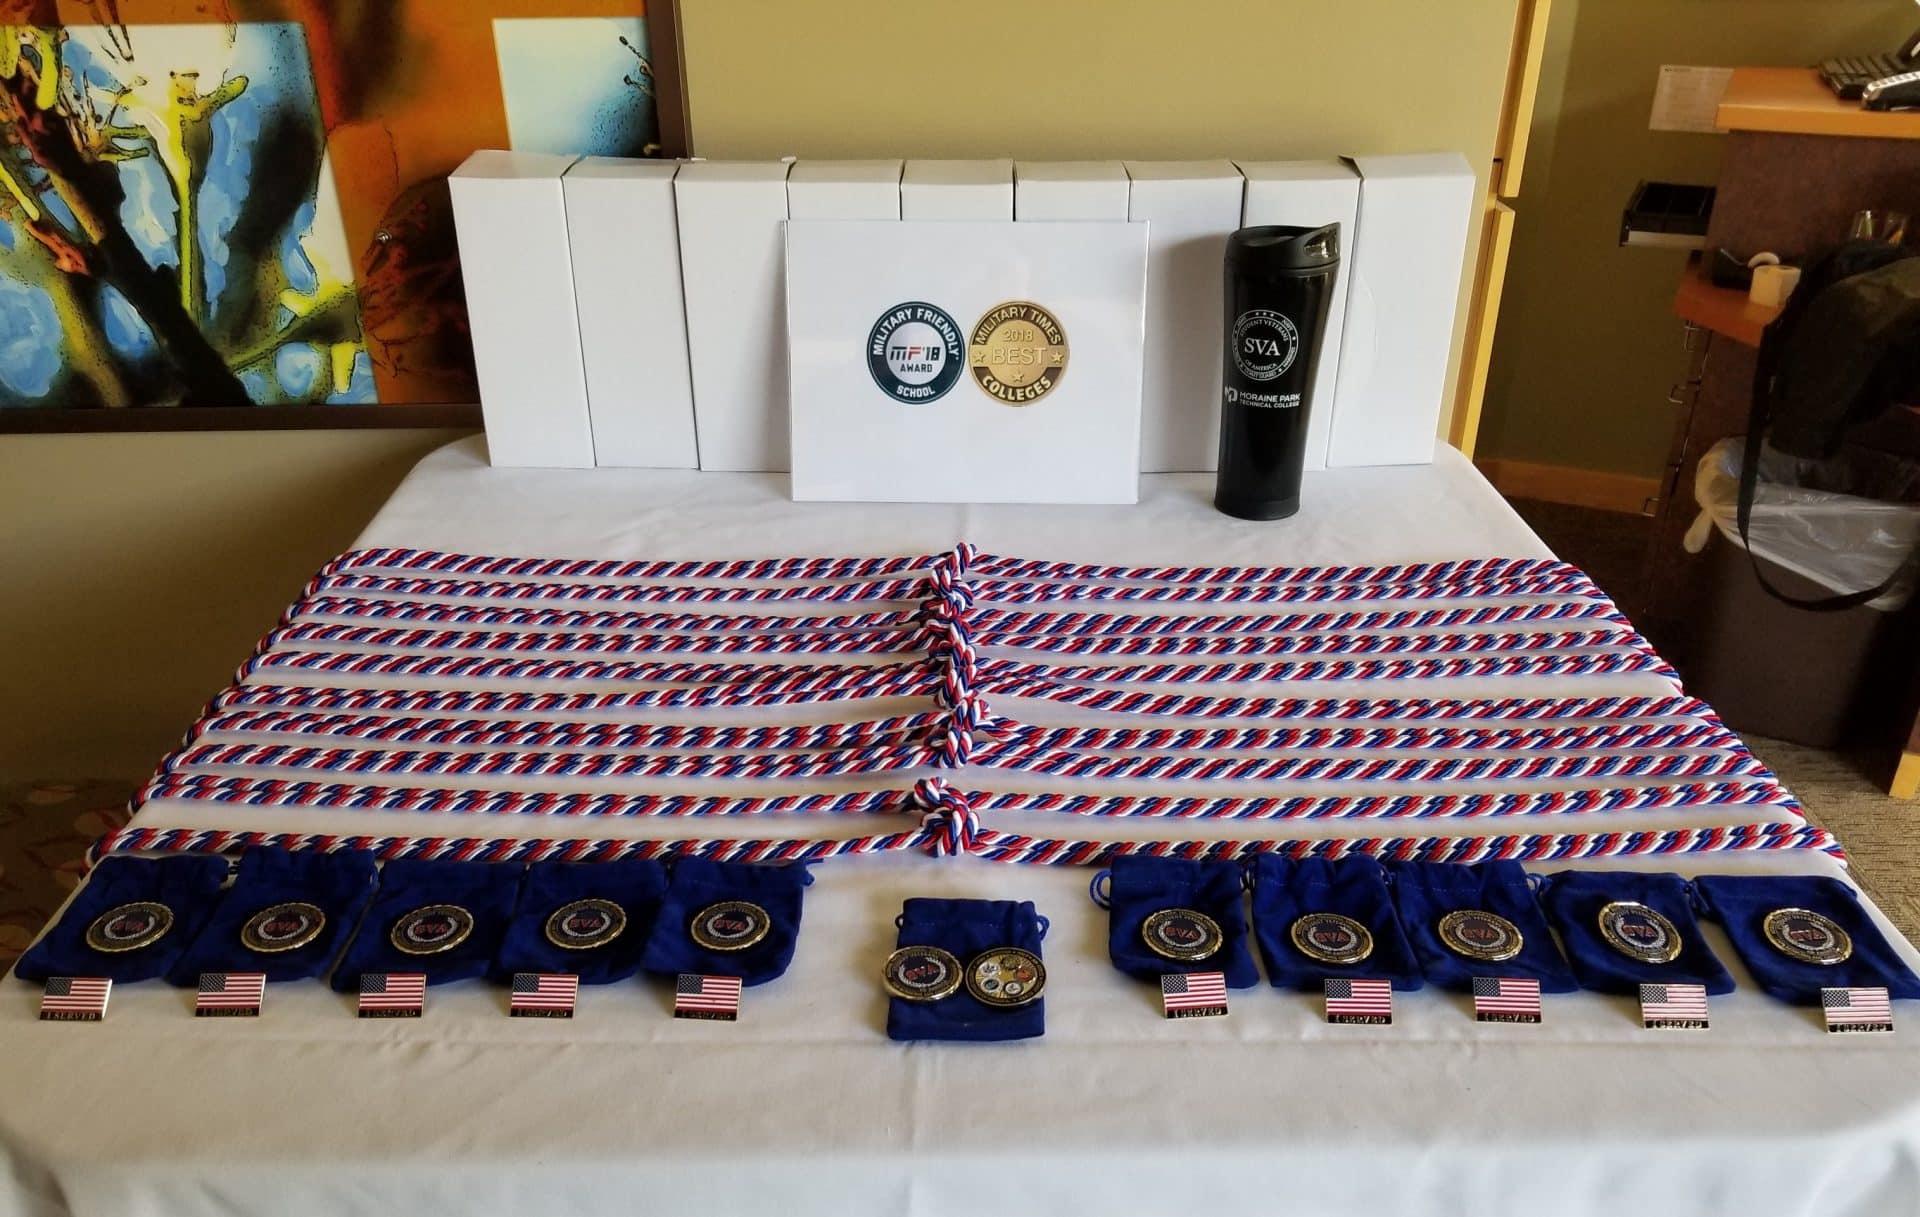 veteran awards on a table